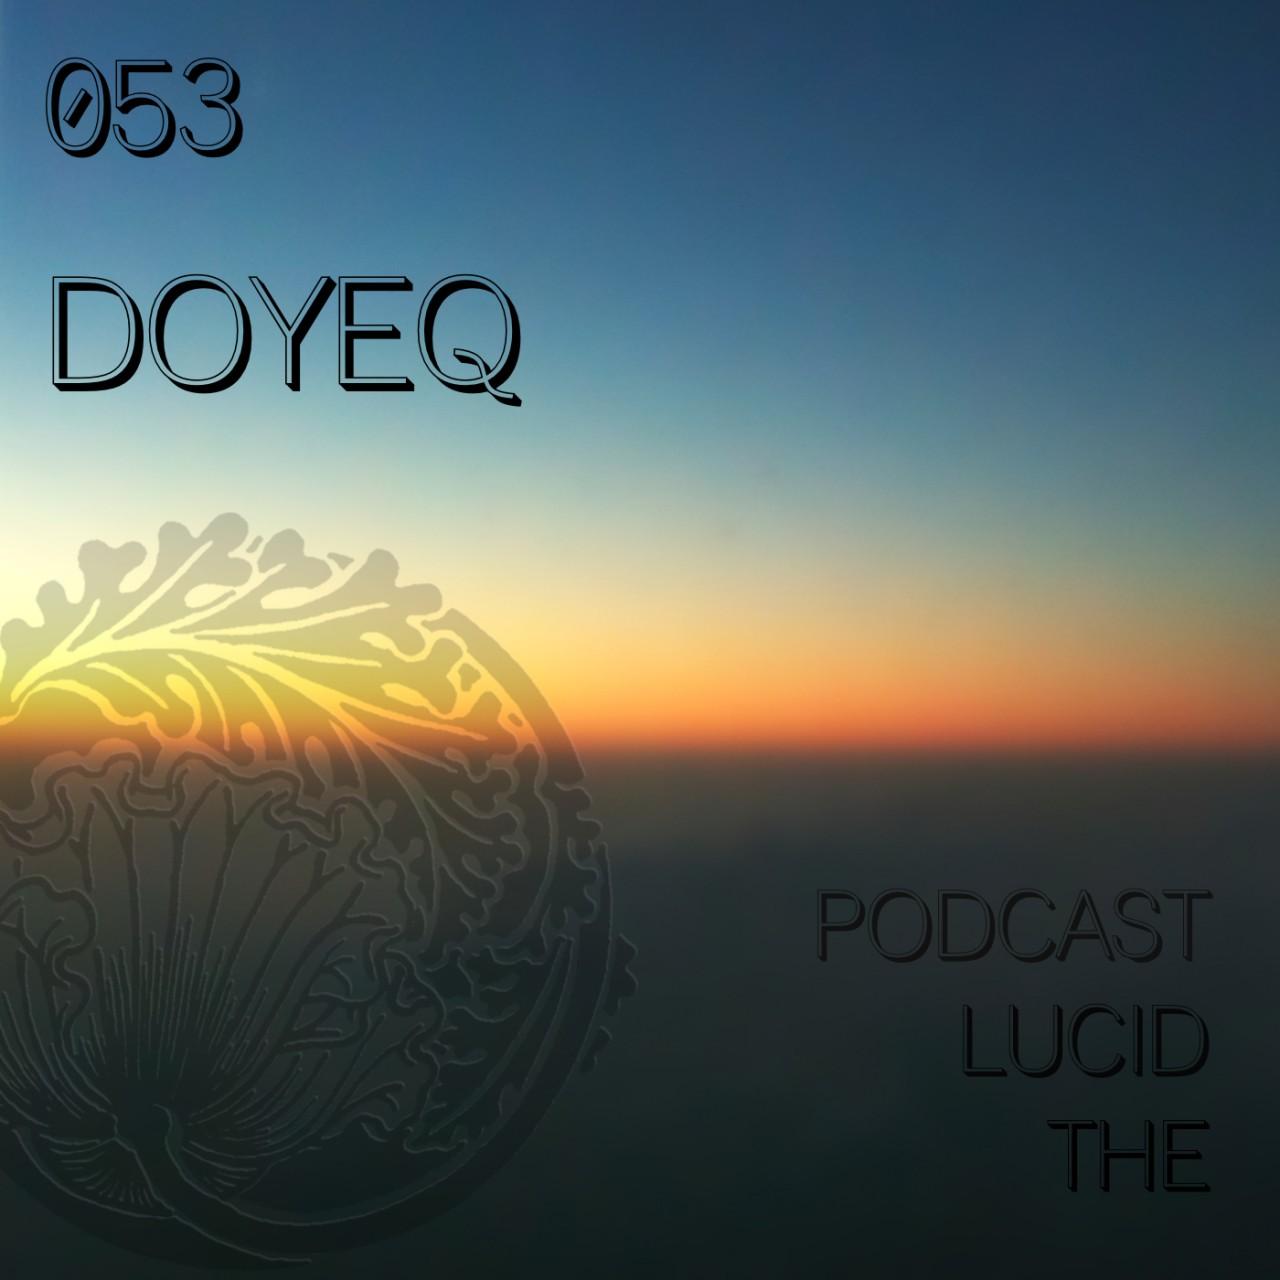 The Lucid Podcast: 053 DOYEQ